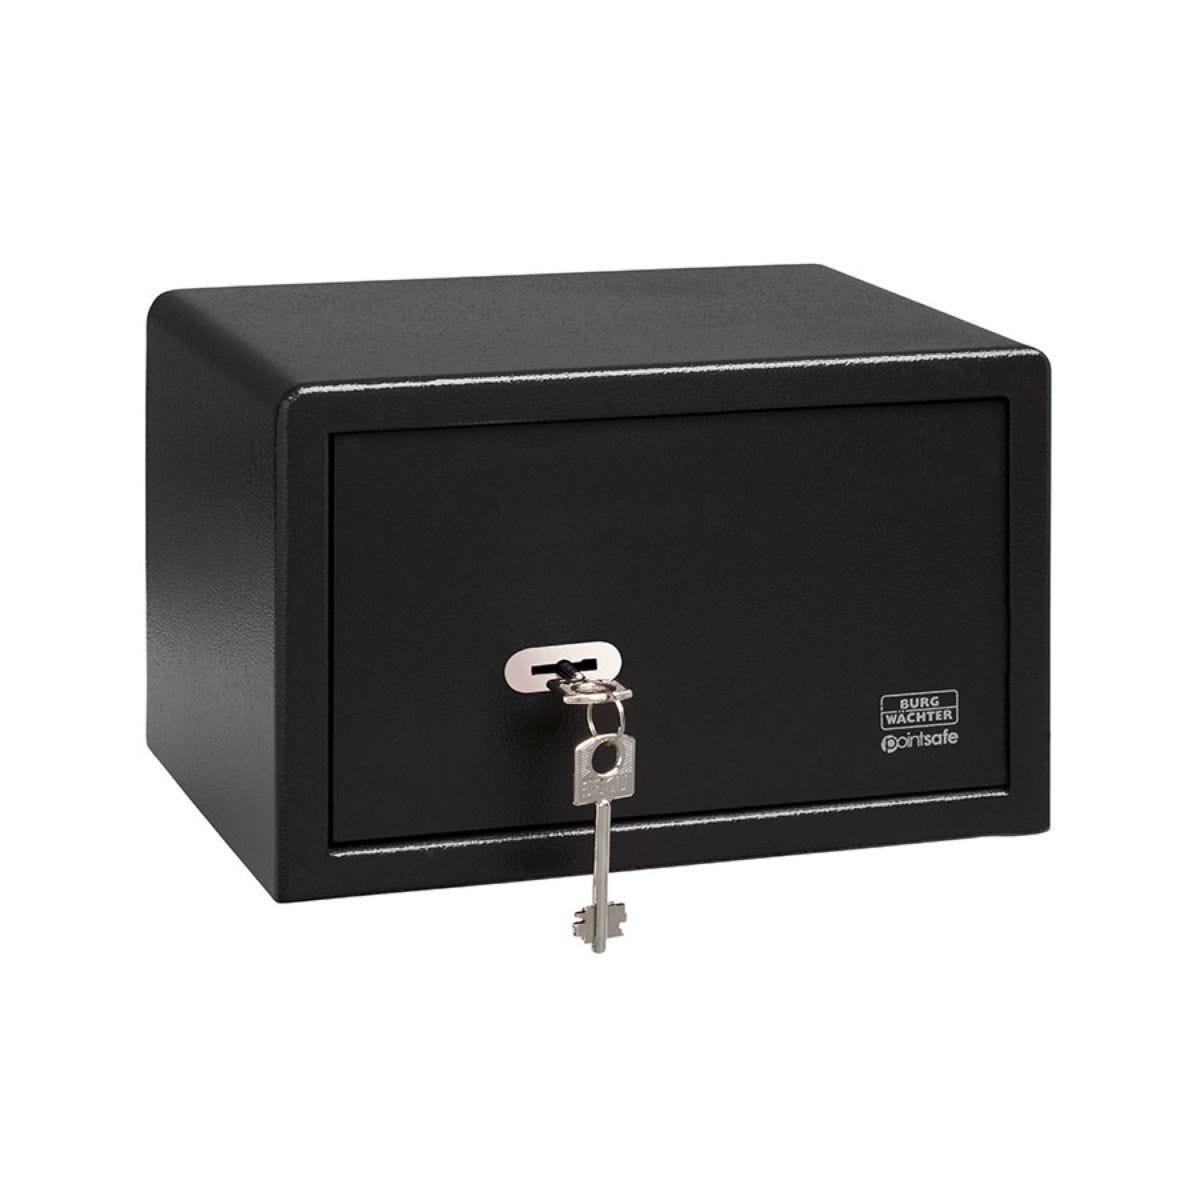 Burg-Wachter PointSafe Key Safe - 6.7L